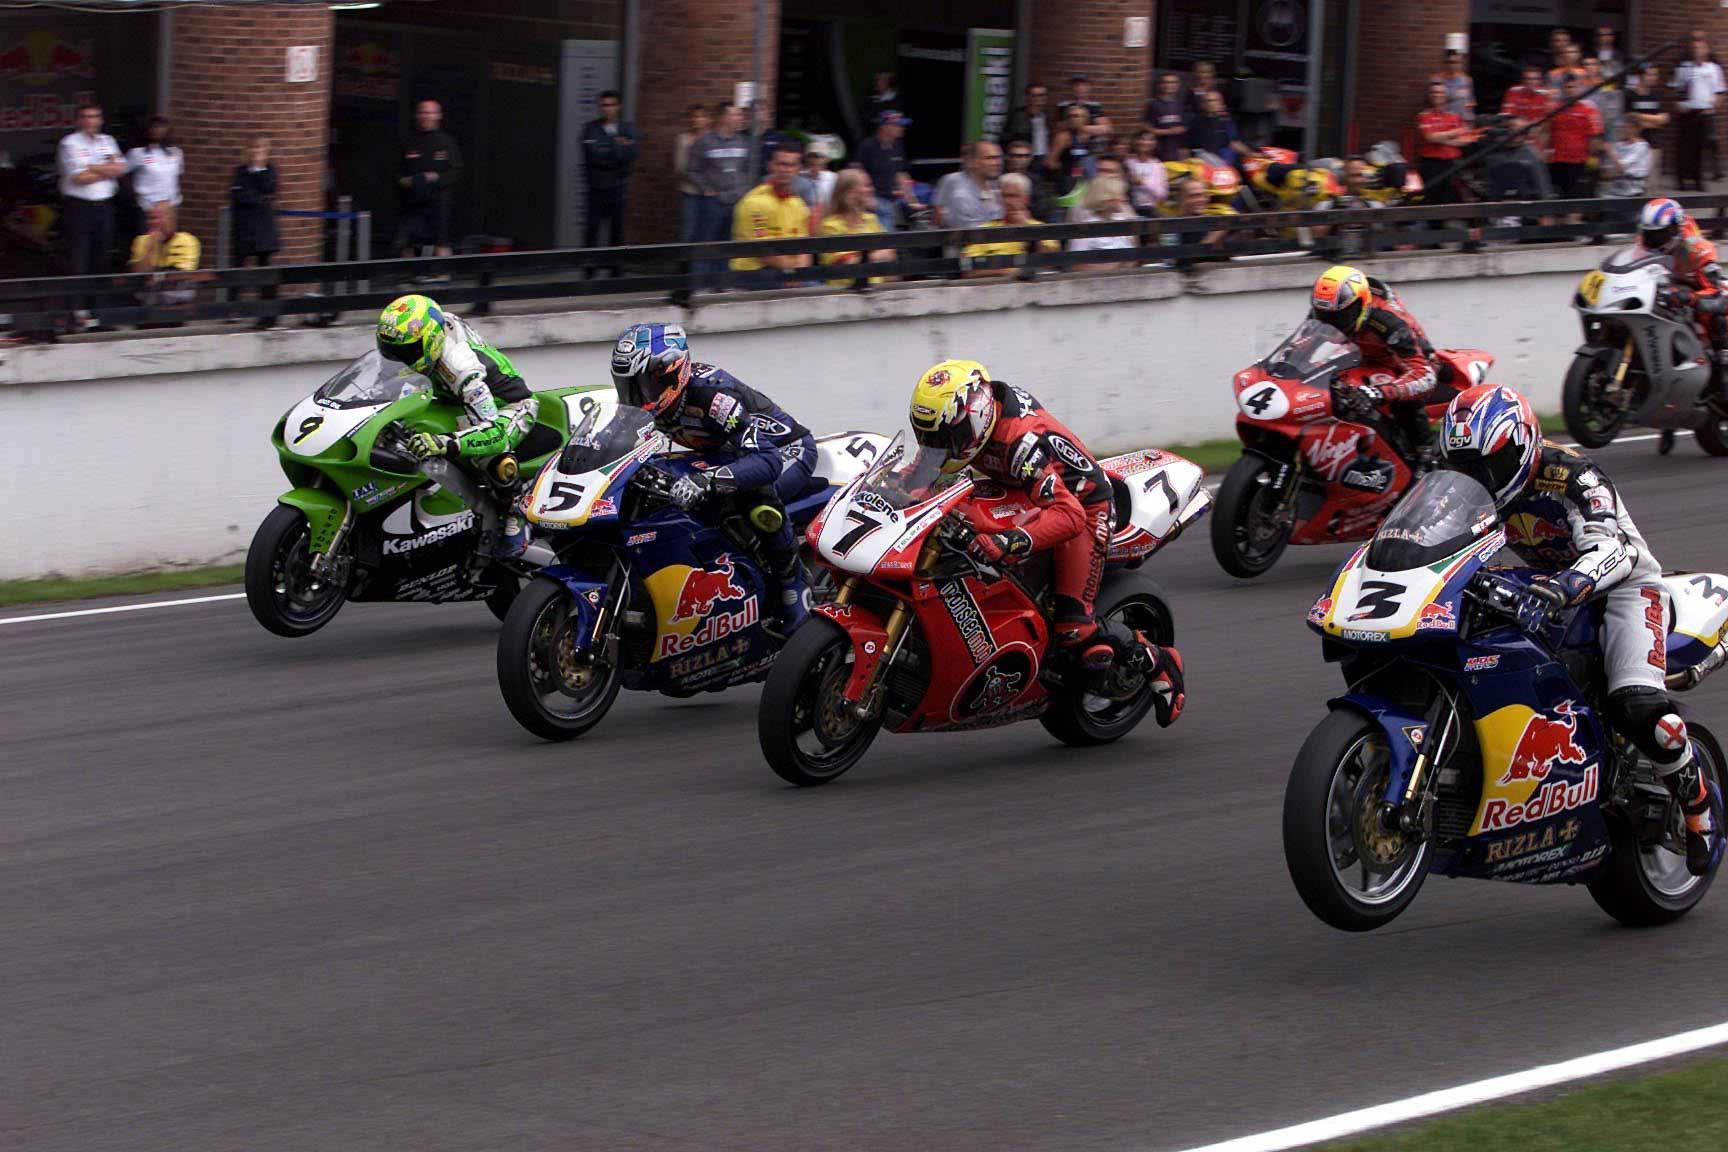 A classic BSB race start